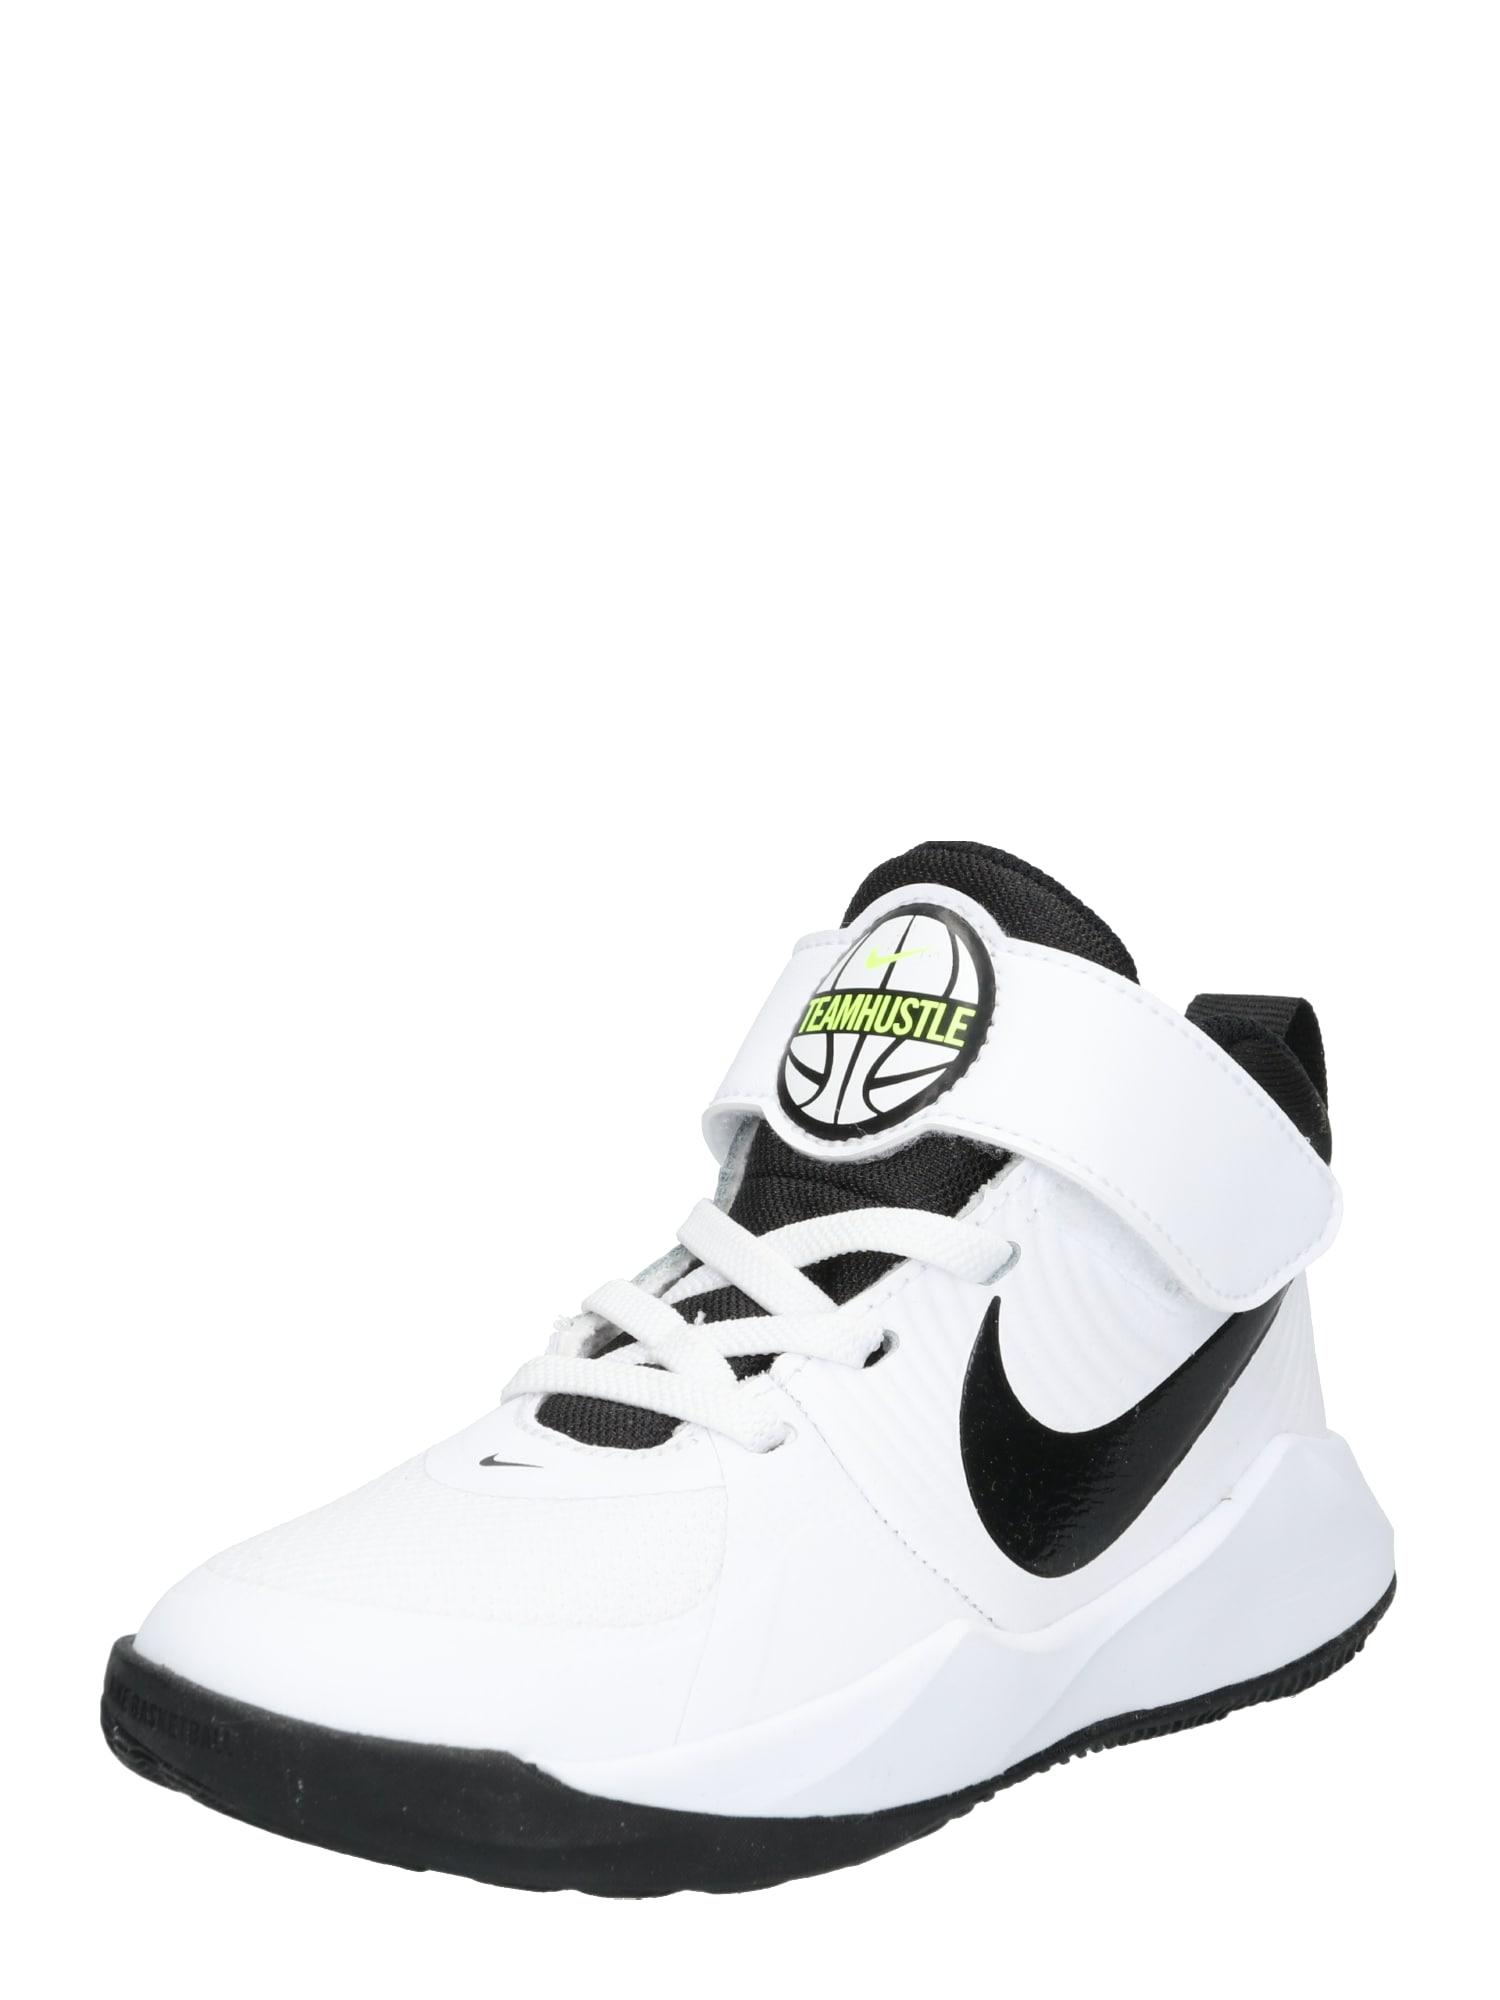 NIKE Chaussure de sport 'TEAM HUSTLE D 9 (PS)'  - Blanc - Taille: 11.5C - boy